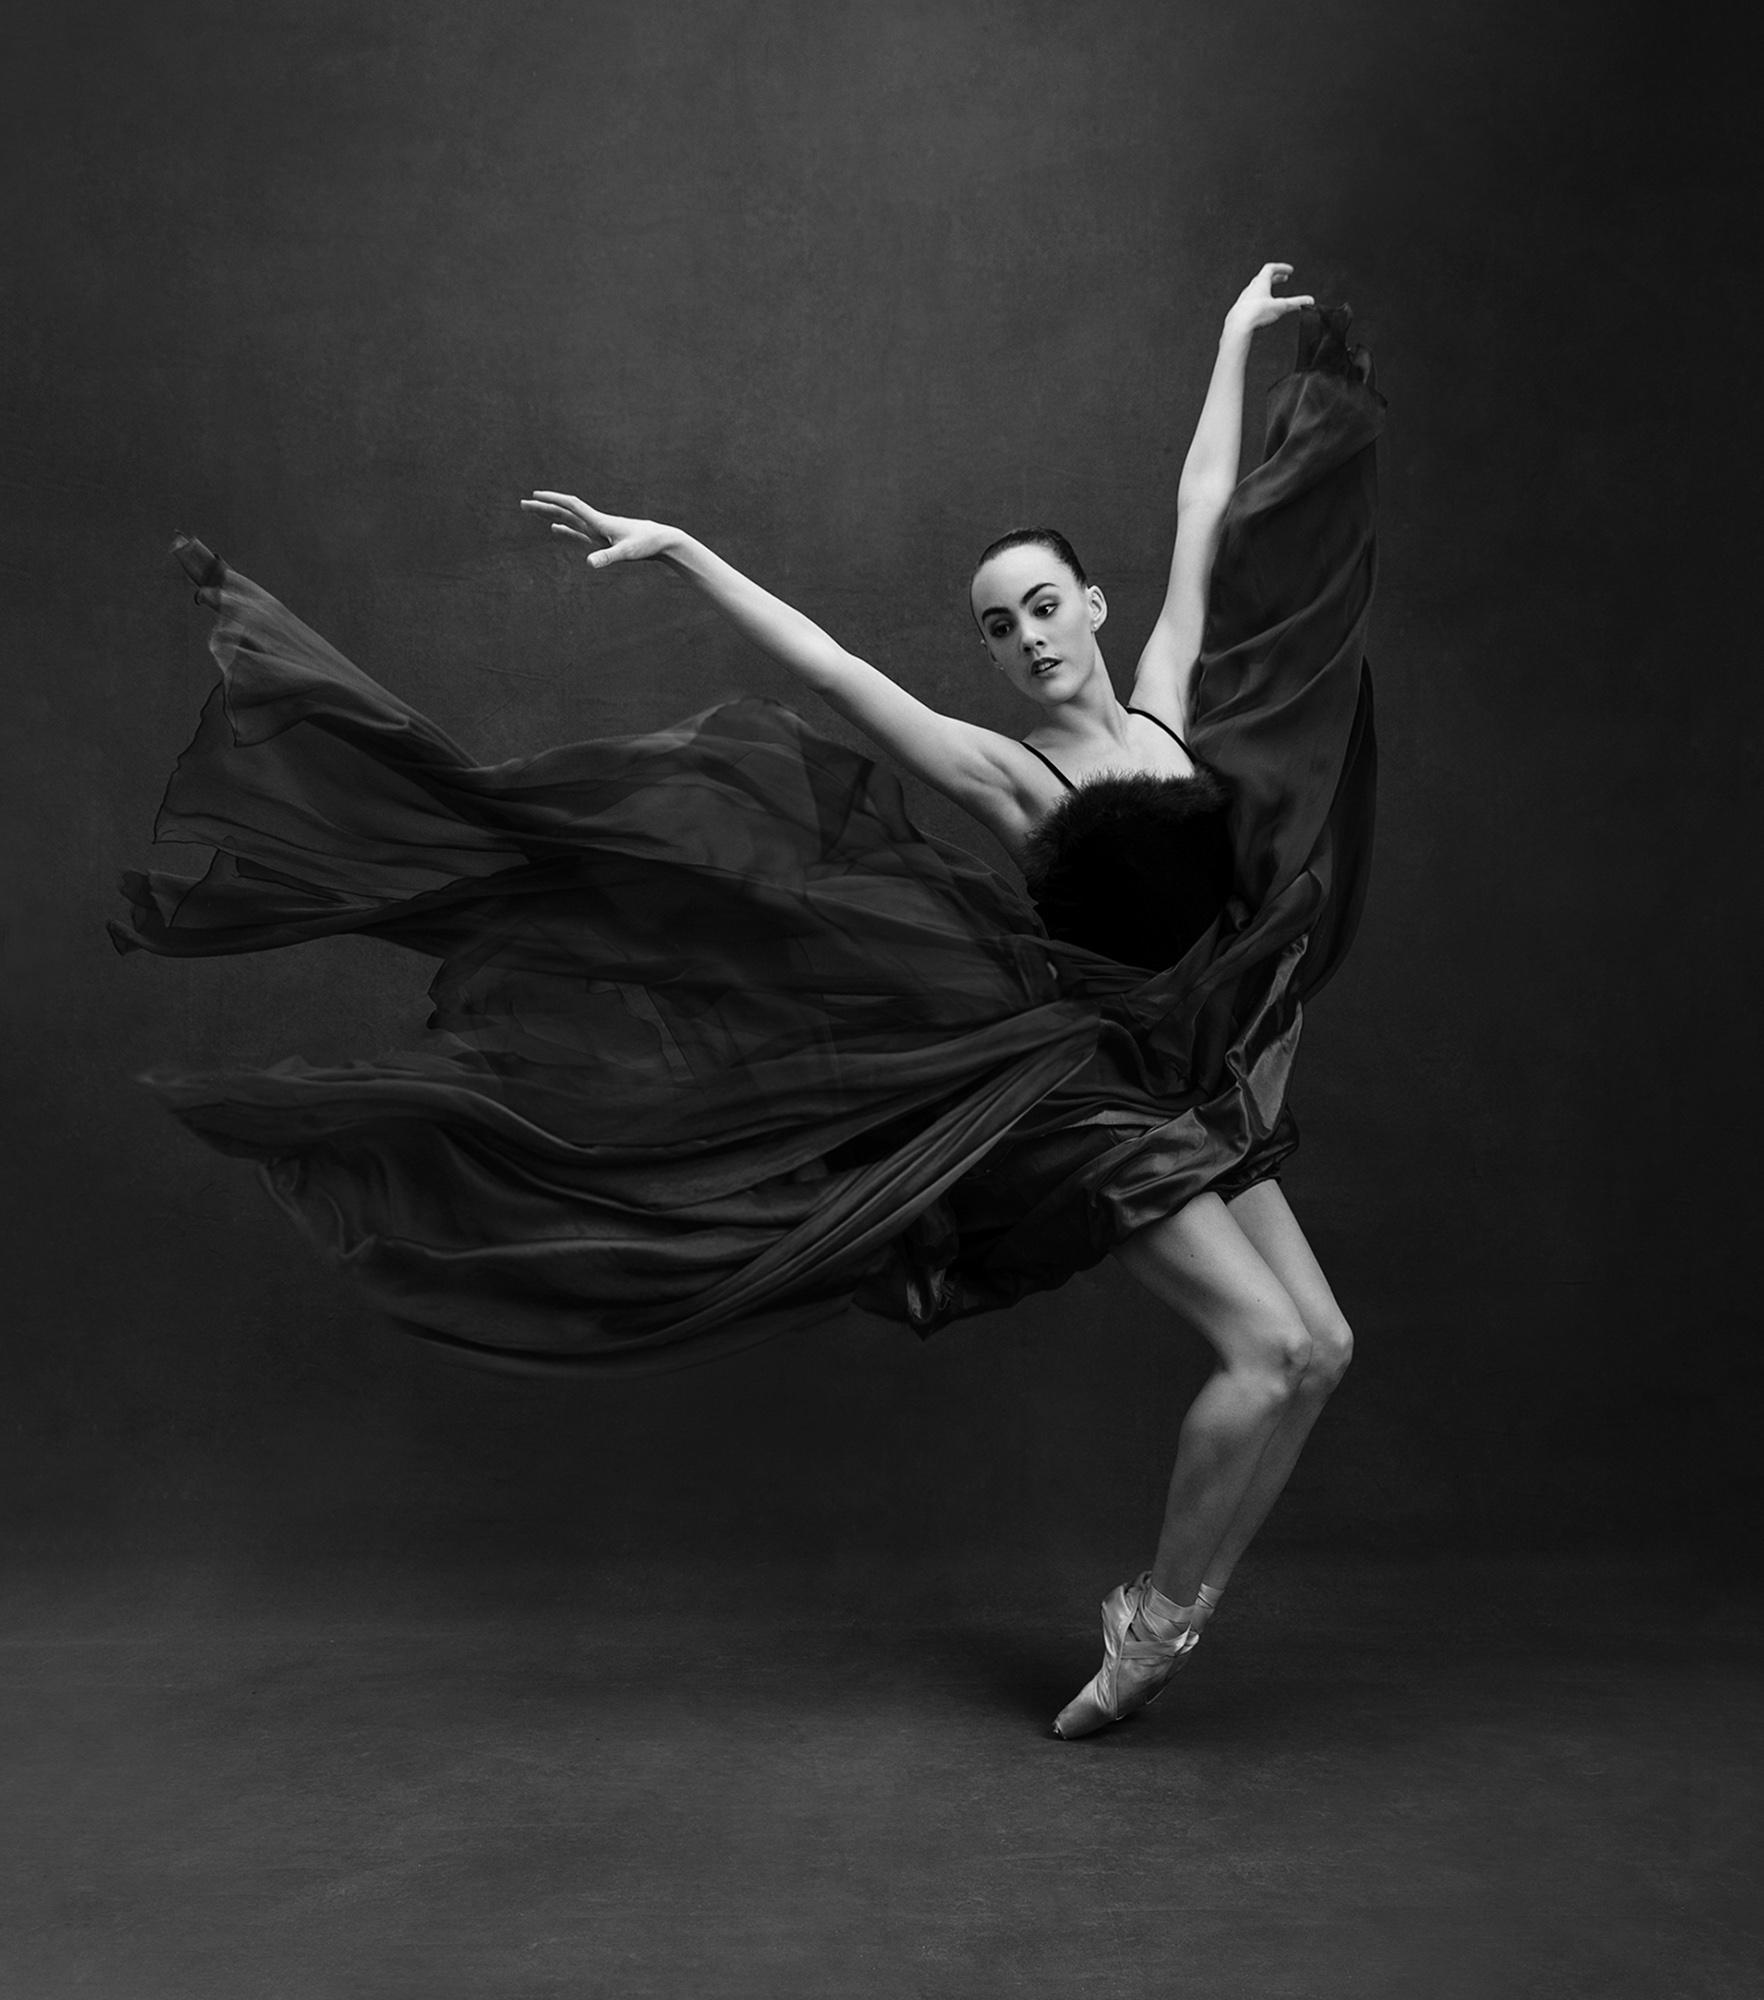 Amazing dance photography by Mayumi Acosta in Sacramentoand Northern California.jpg